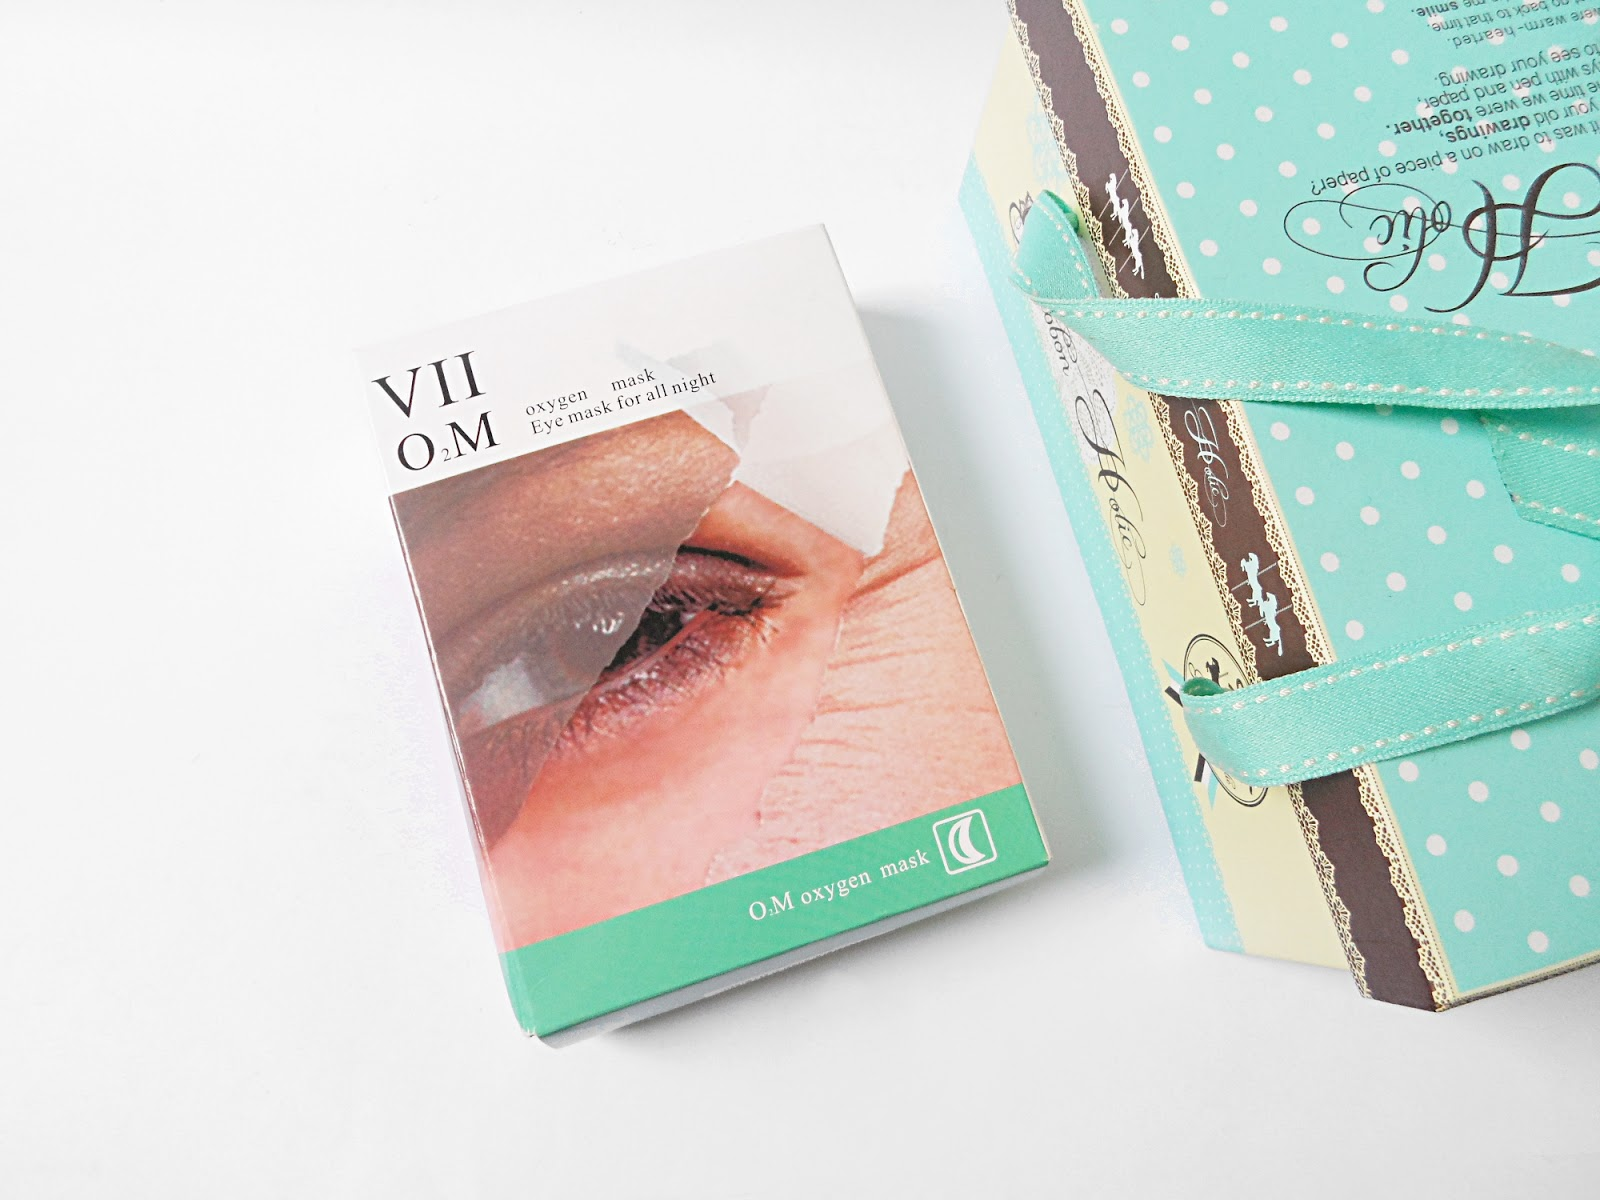 liz breygel review blogger eye mask oxygen for all night VIICODE